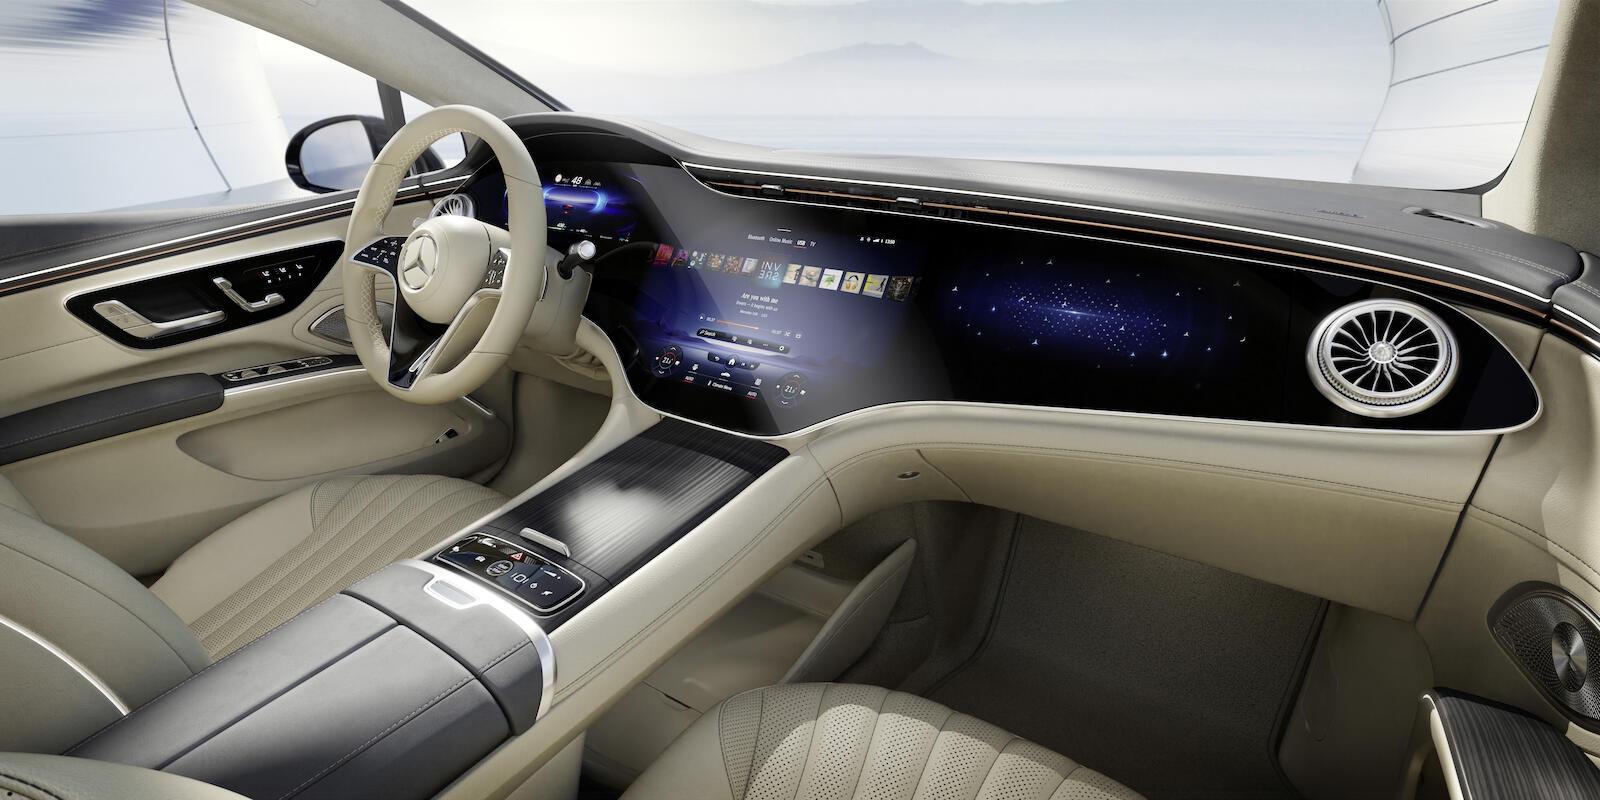 Mercedes Eq, Der Neue Eqs, Interieur Design Mercedes Eq, The New Eqs, Interior Design